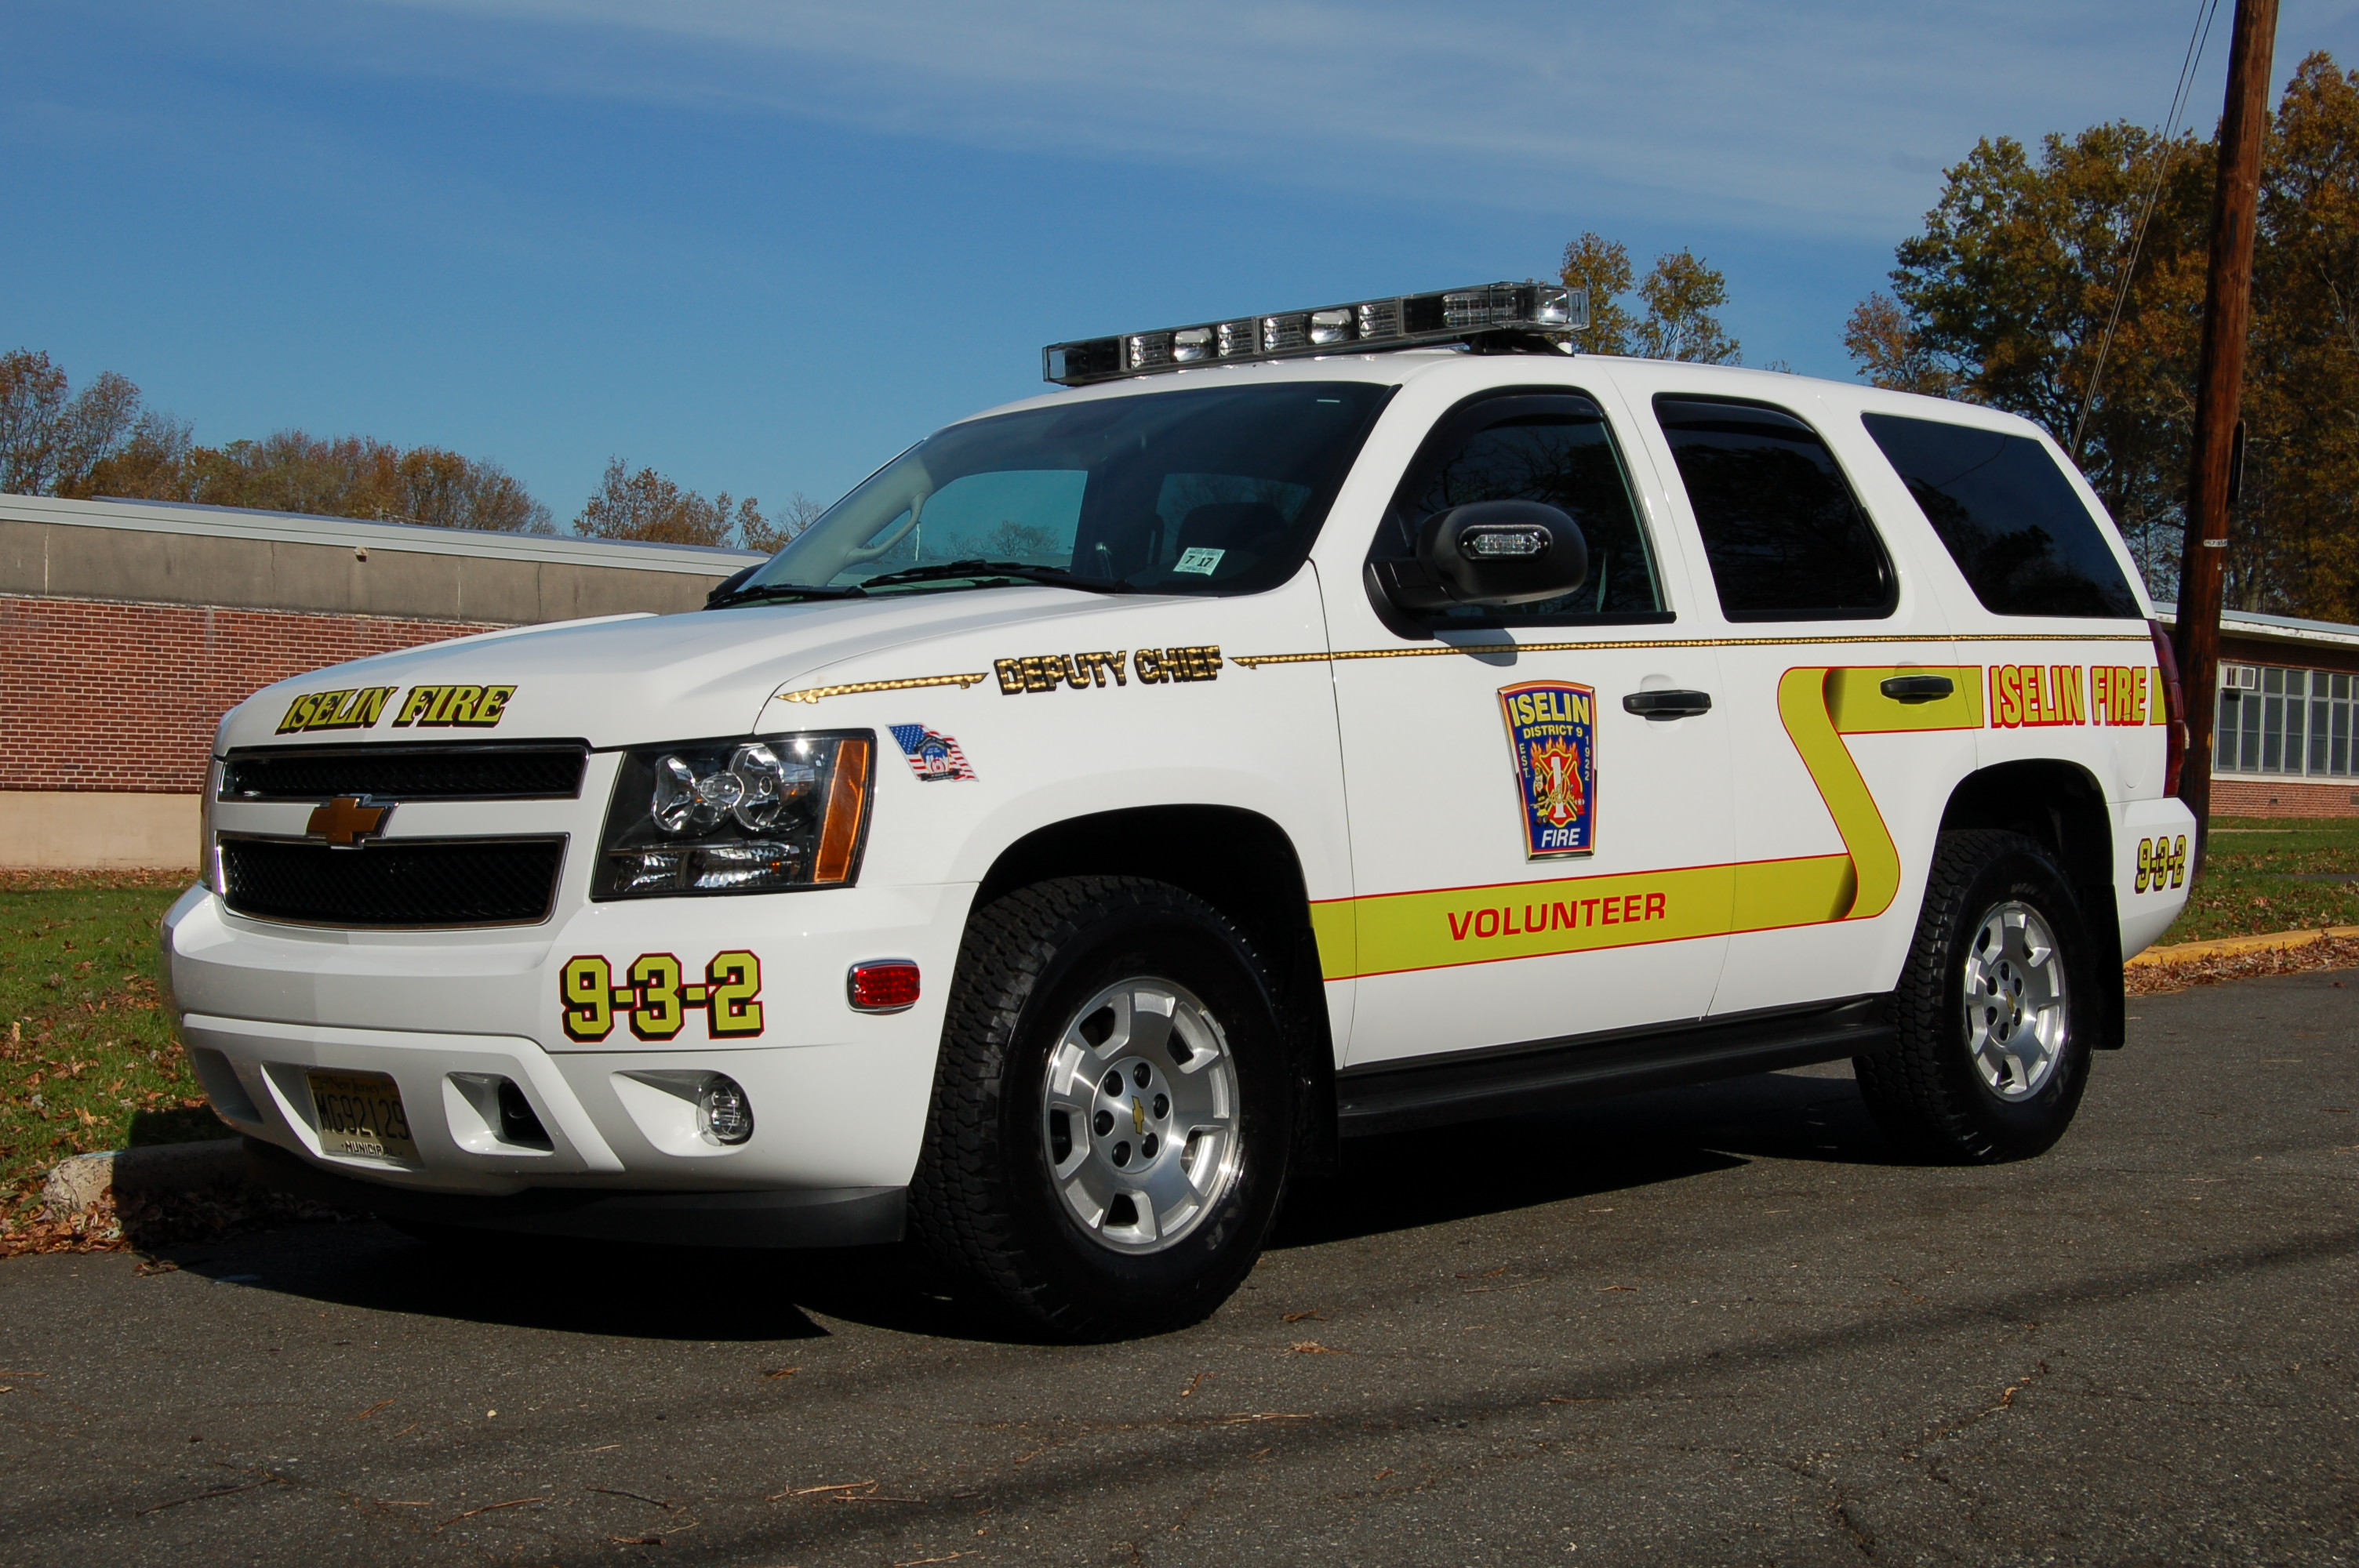 Iselin Volunteer Fire Company 1 District 9